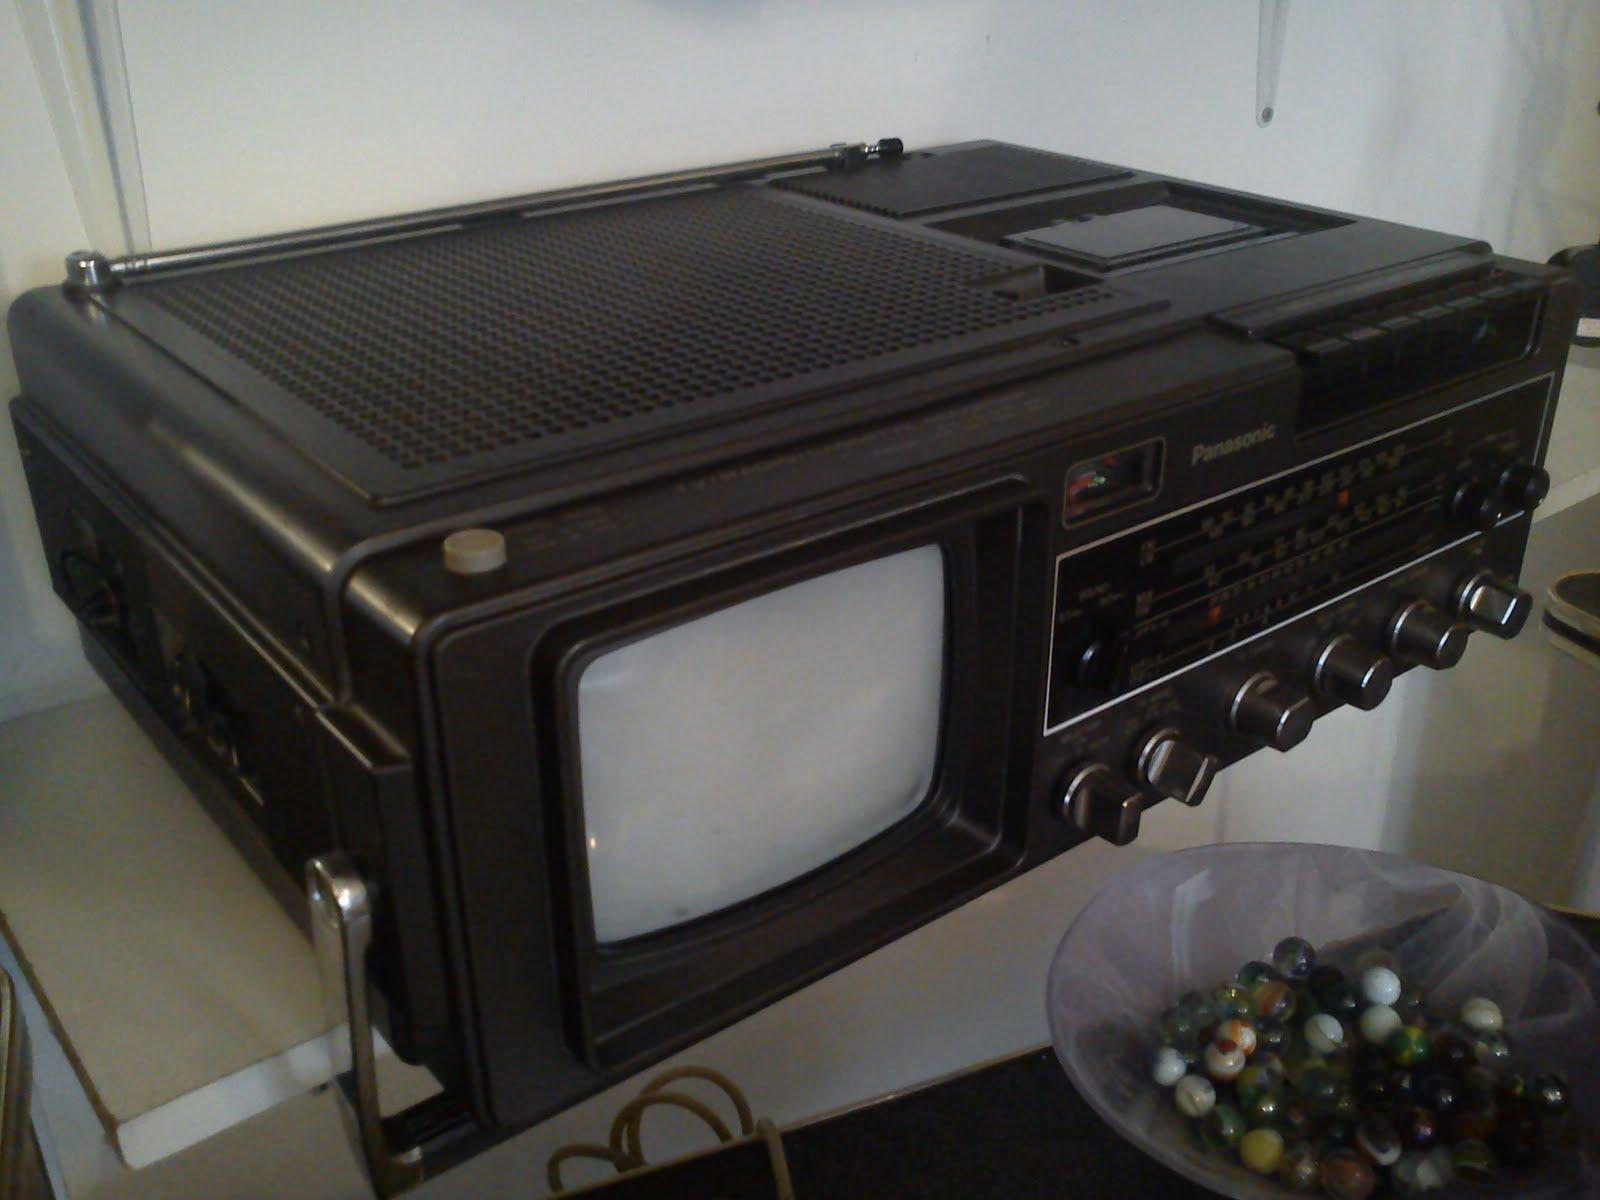 Radio 1970 1970s Panasonic Portable Radio